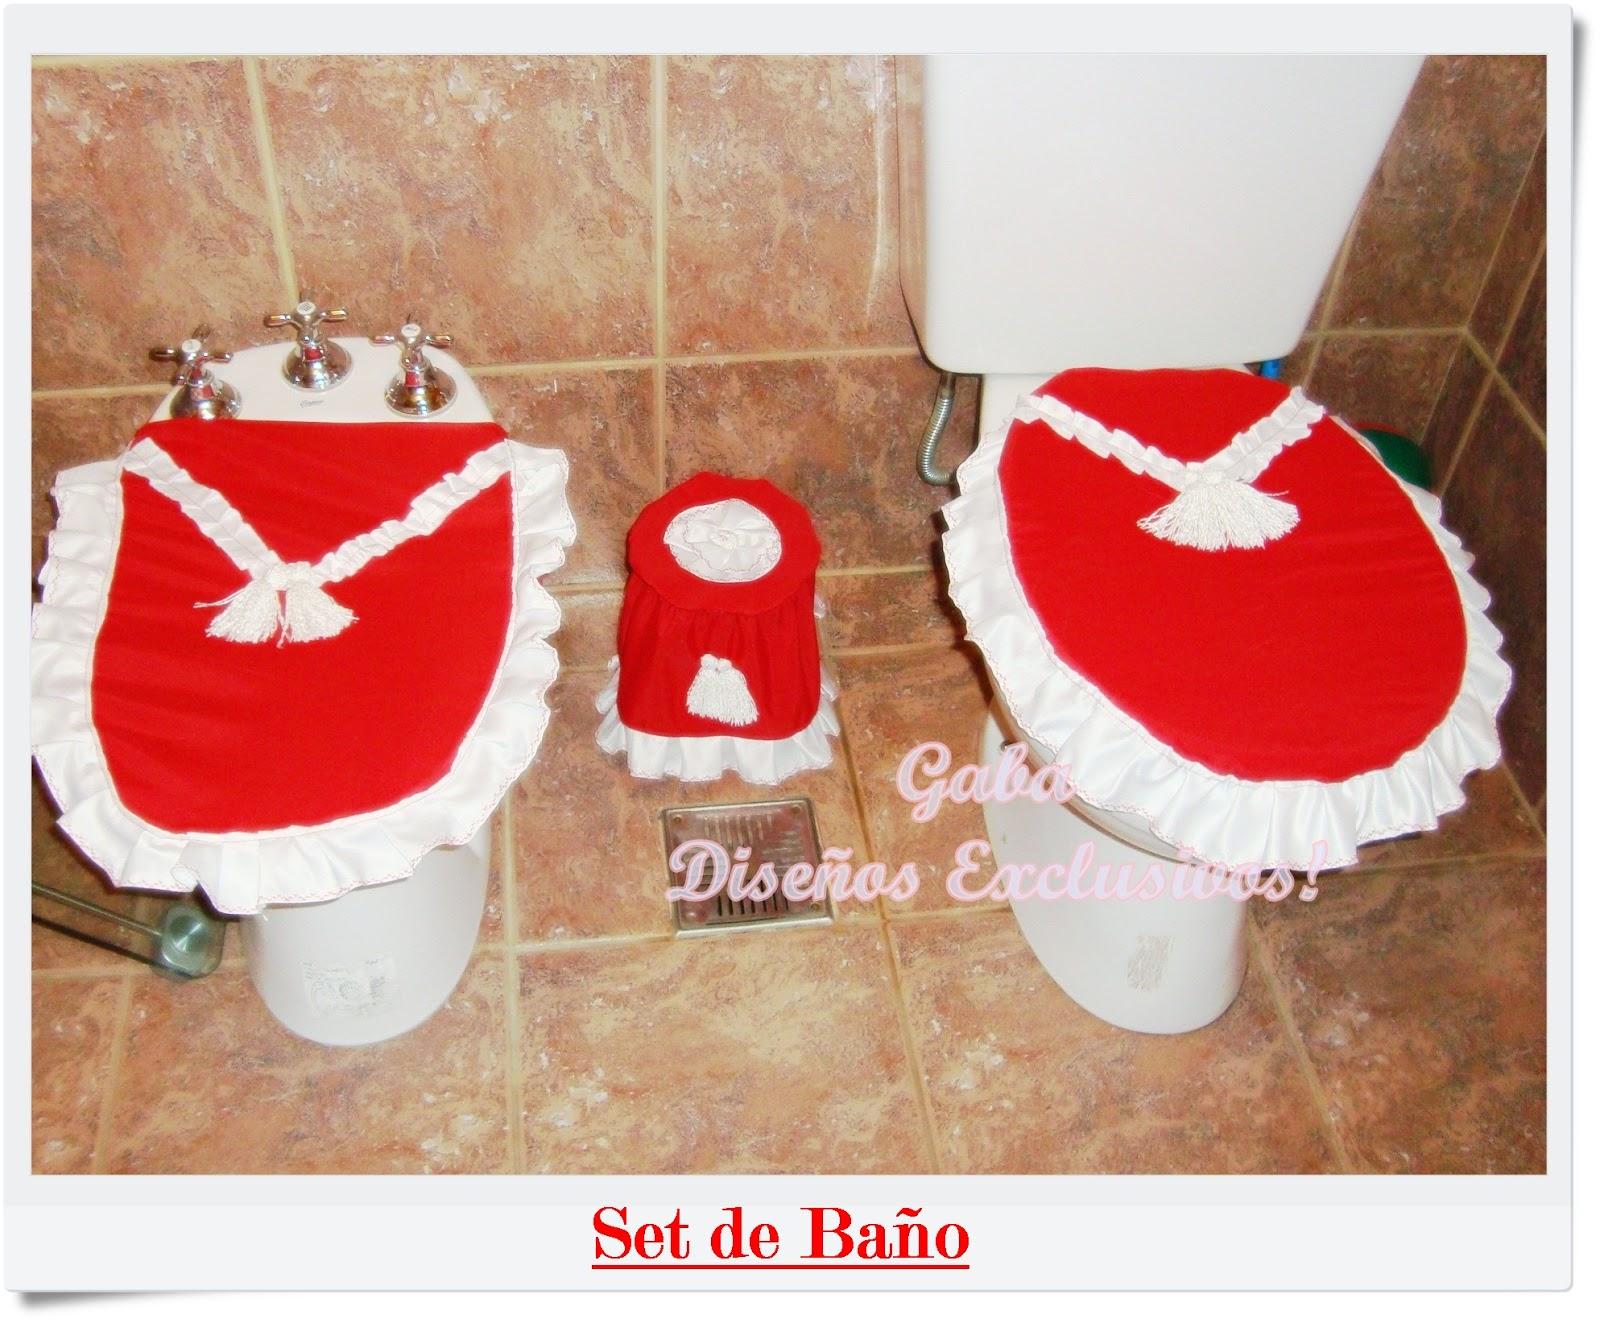 Set De Baño Para Souvenir:Creaciones: Set de Baño